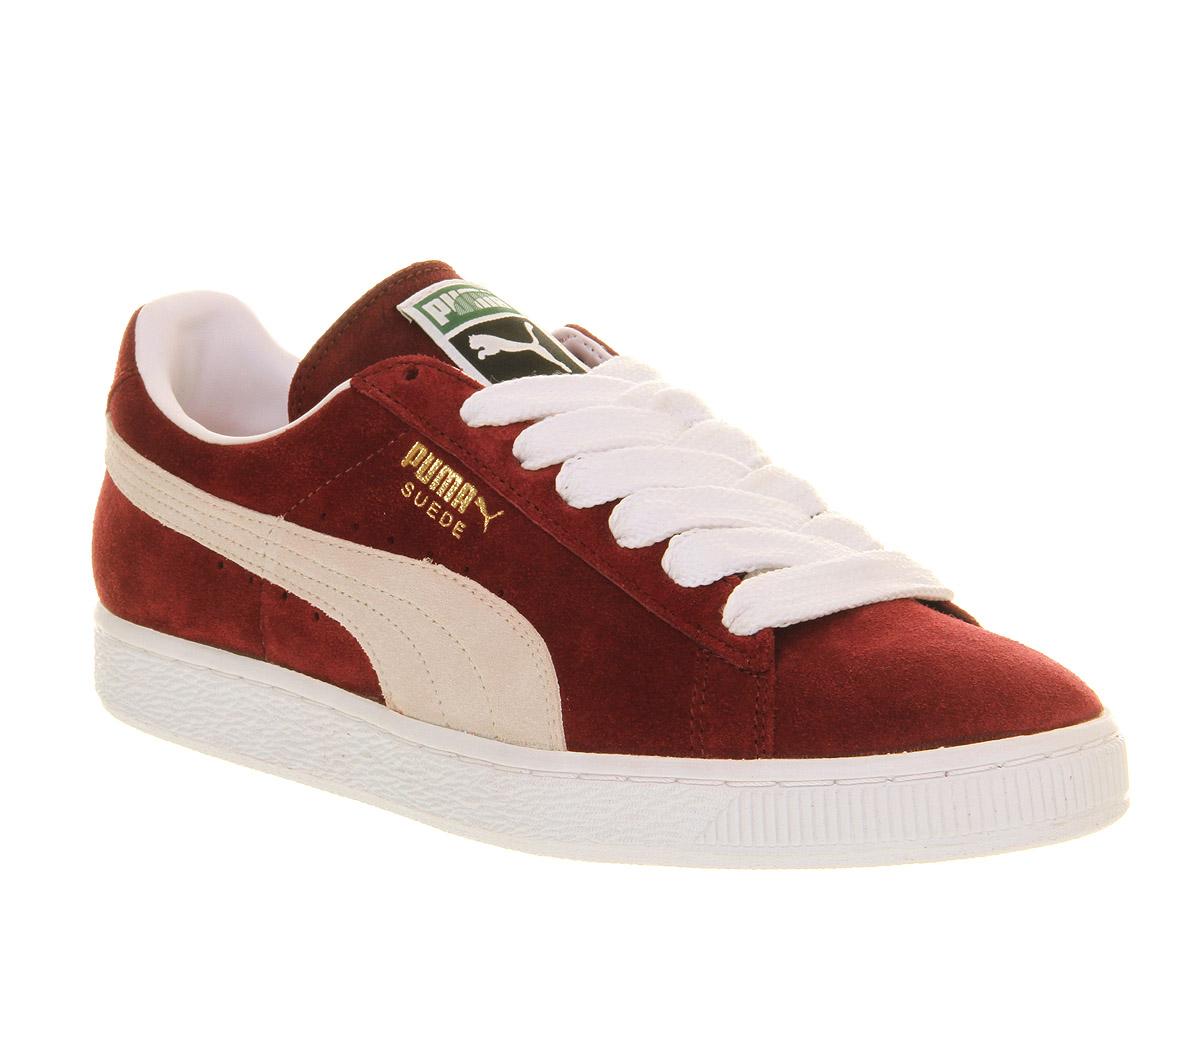 9b415a8a789d9b Puma Suede Classic Regal Red wearpointwindfarm.co.uk